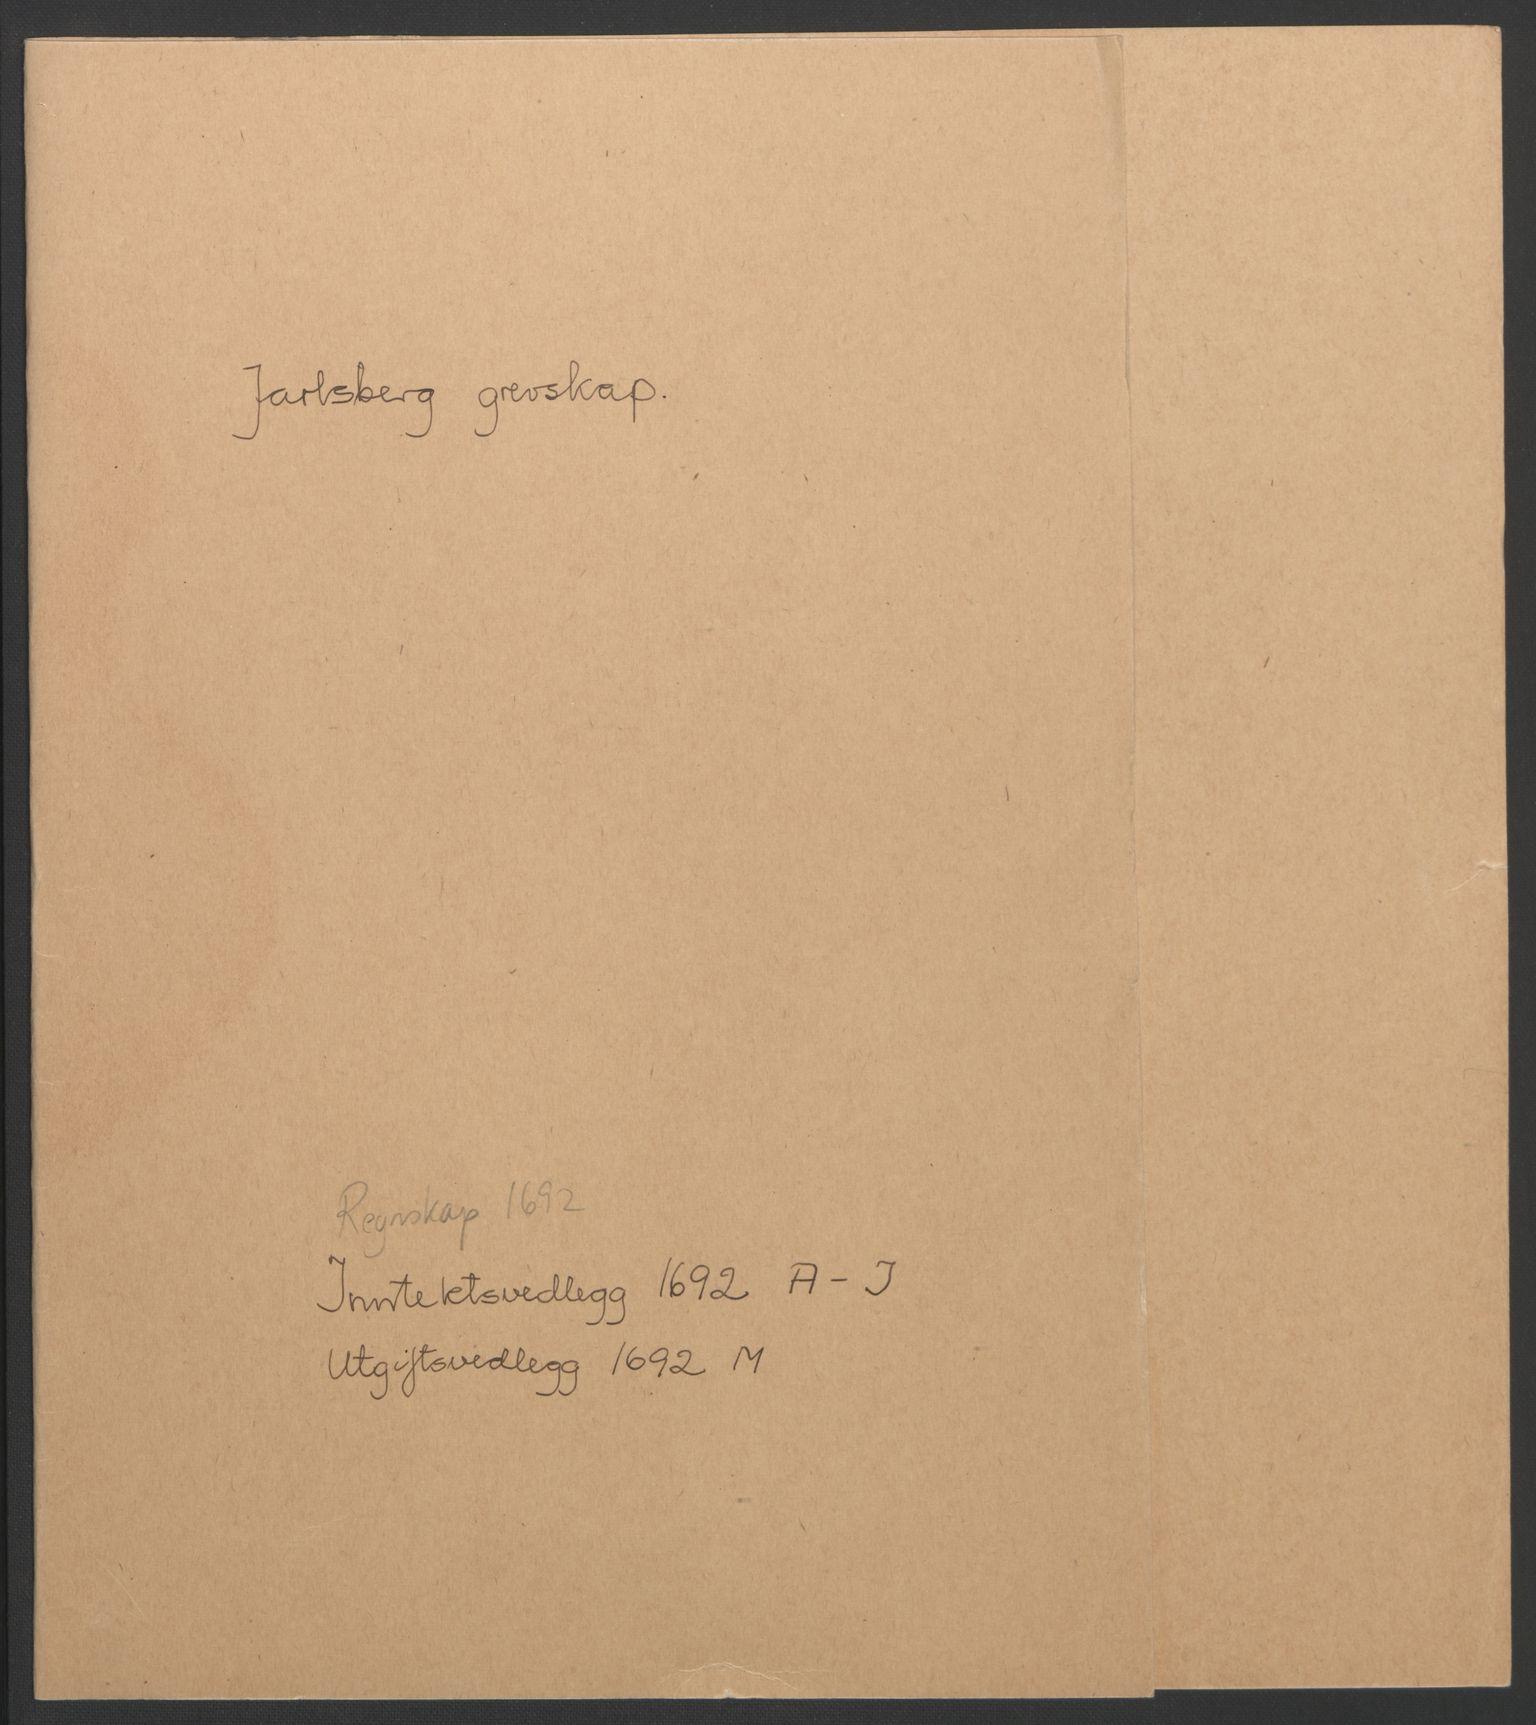 RA, Rentekammeret inntil 1814, Reviderte regnskaper, Fogderegnskap, R32/L1865: Fogderegnskap Jarlsberg grevskap, 1692, s. 2